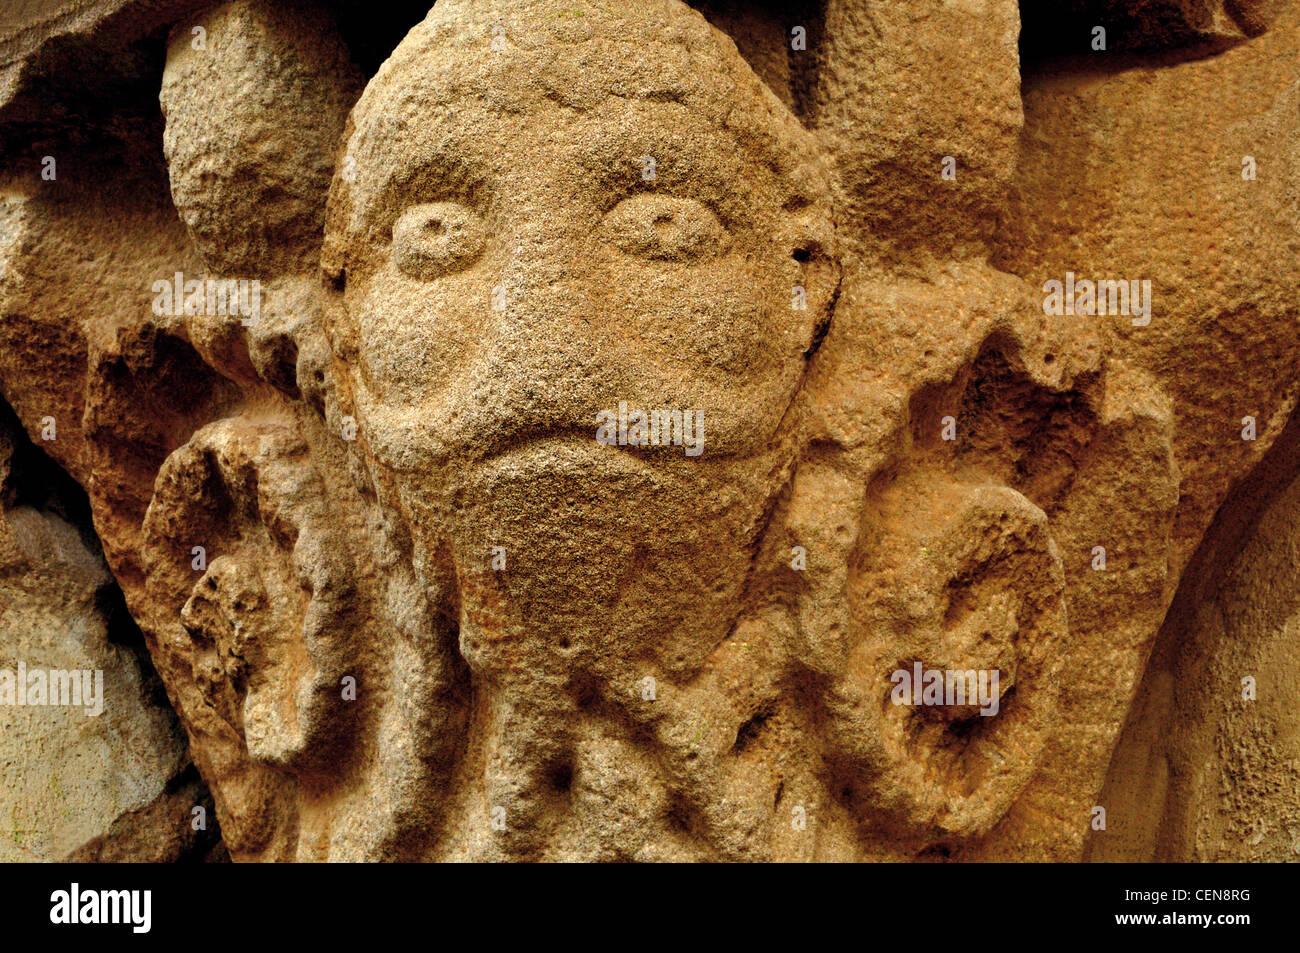 Spain, St. James Way: Detail of a romanesque capital of the eremite church Santa Maria de Eunate - Stock Image